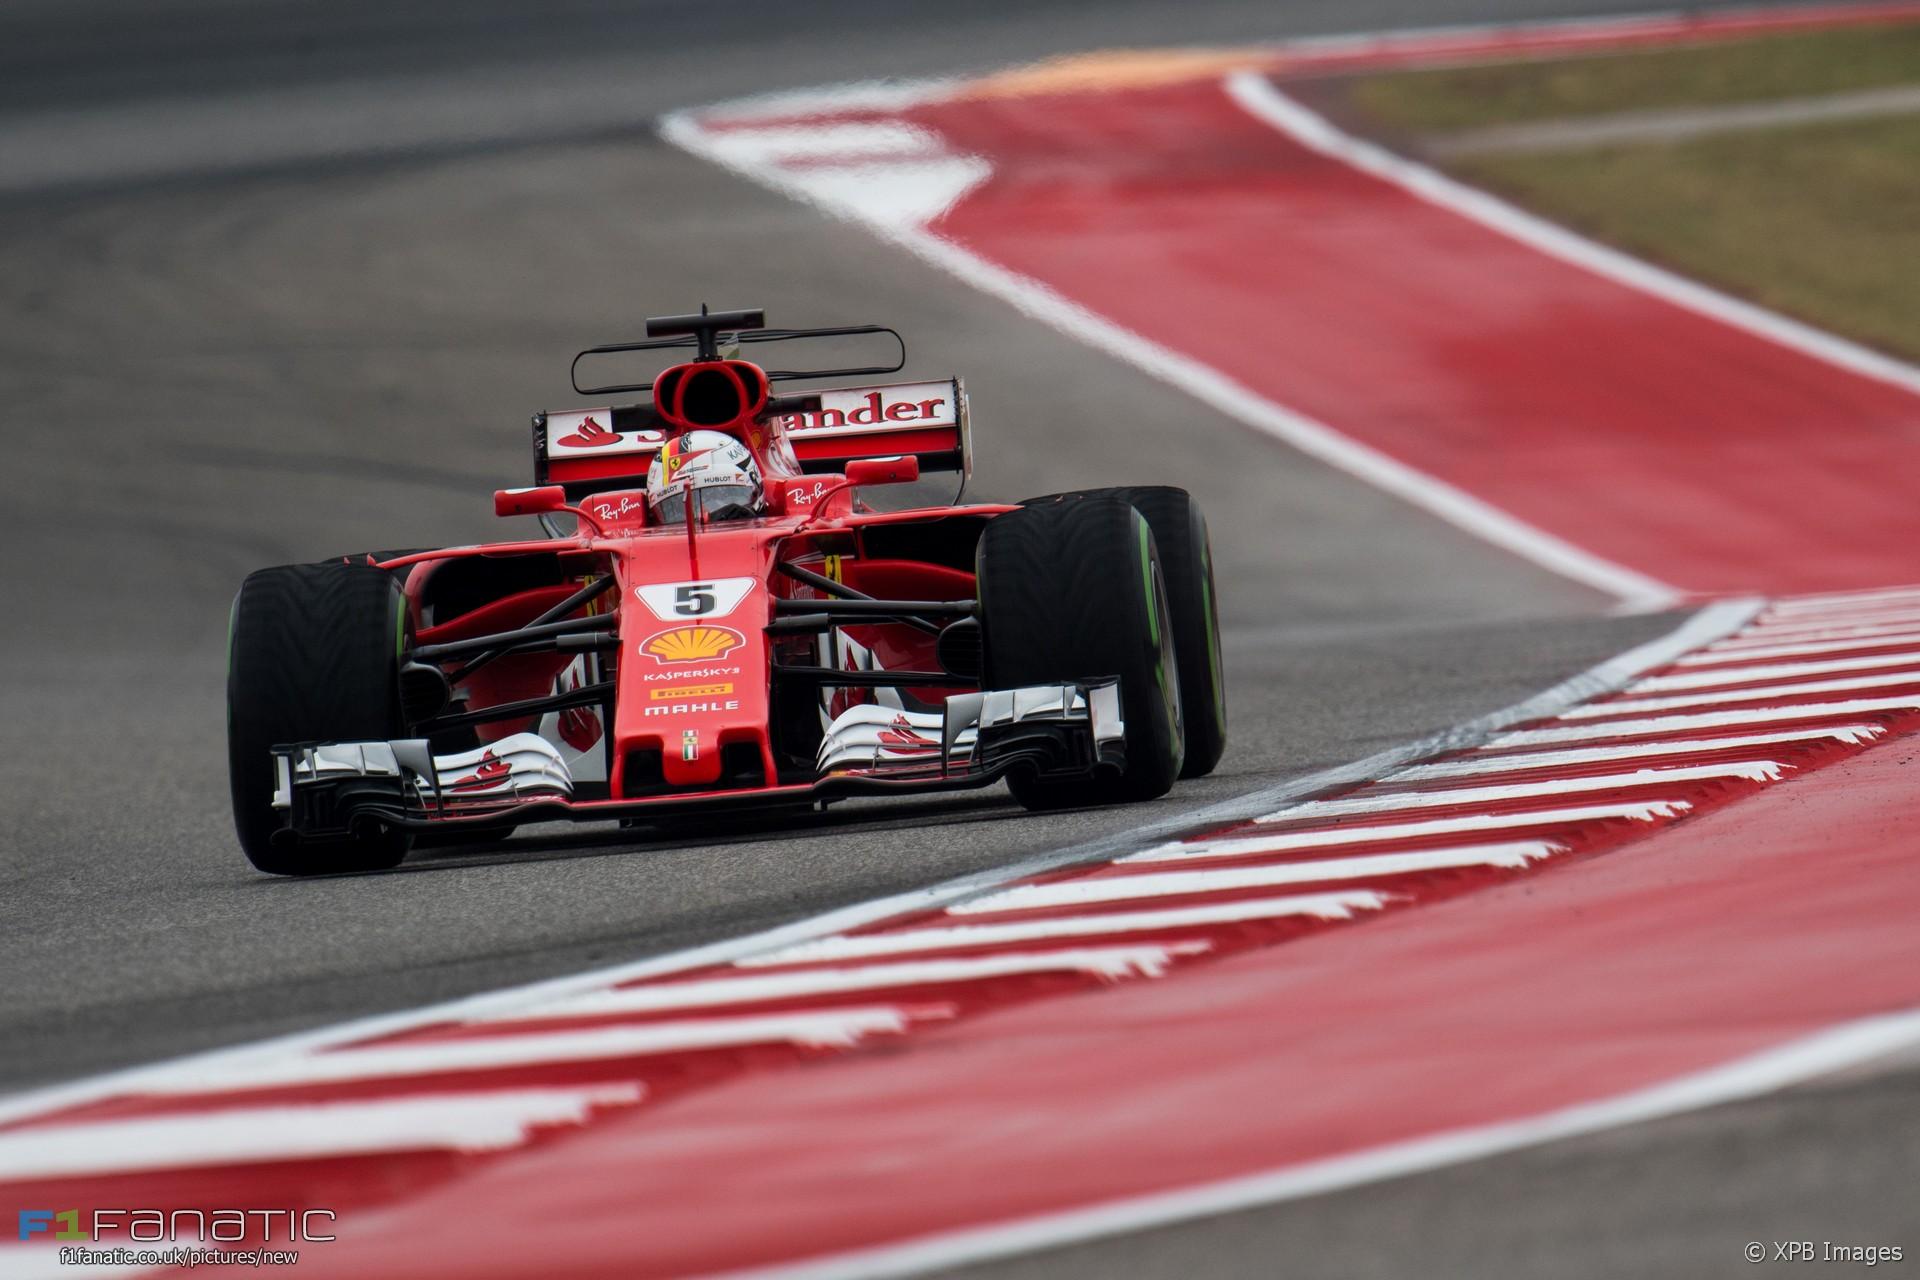 Sebastian Vettel, Ferrari, Circuit of the Americas, 2017